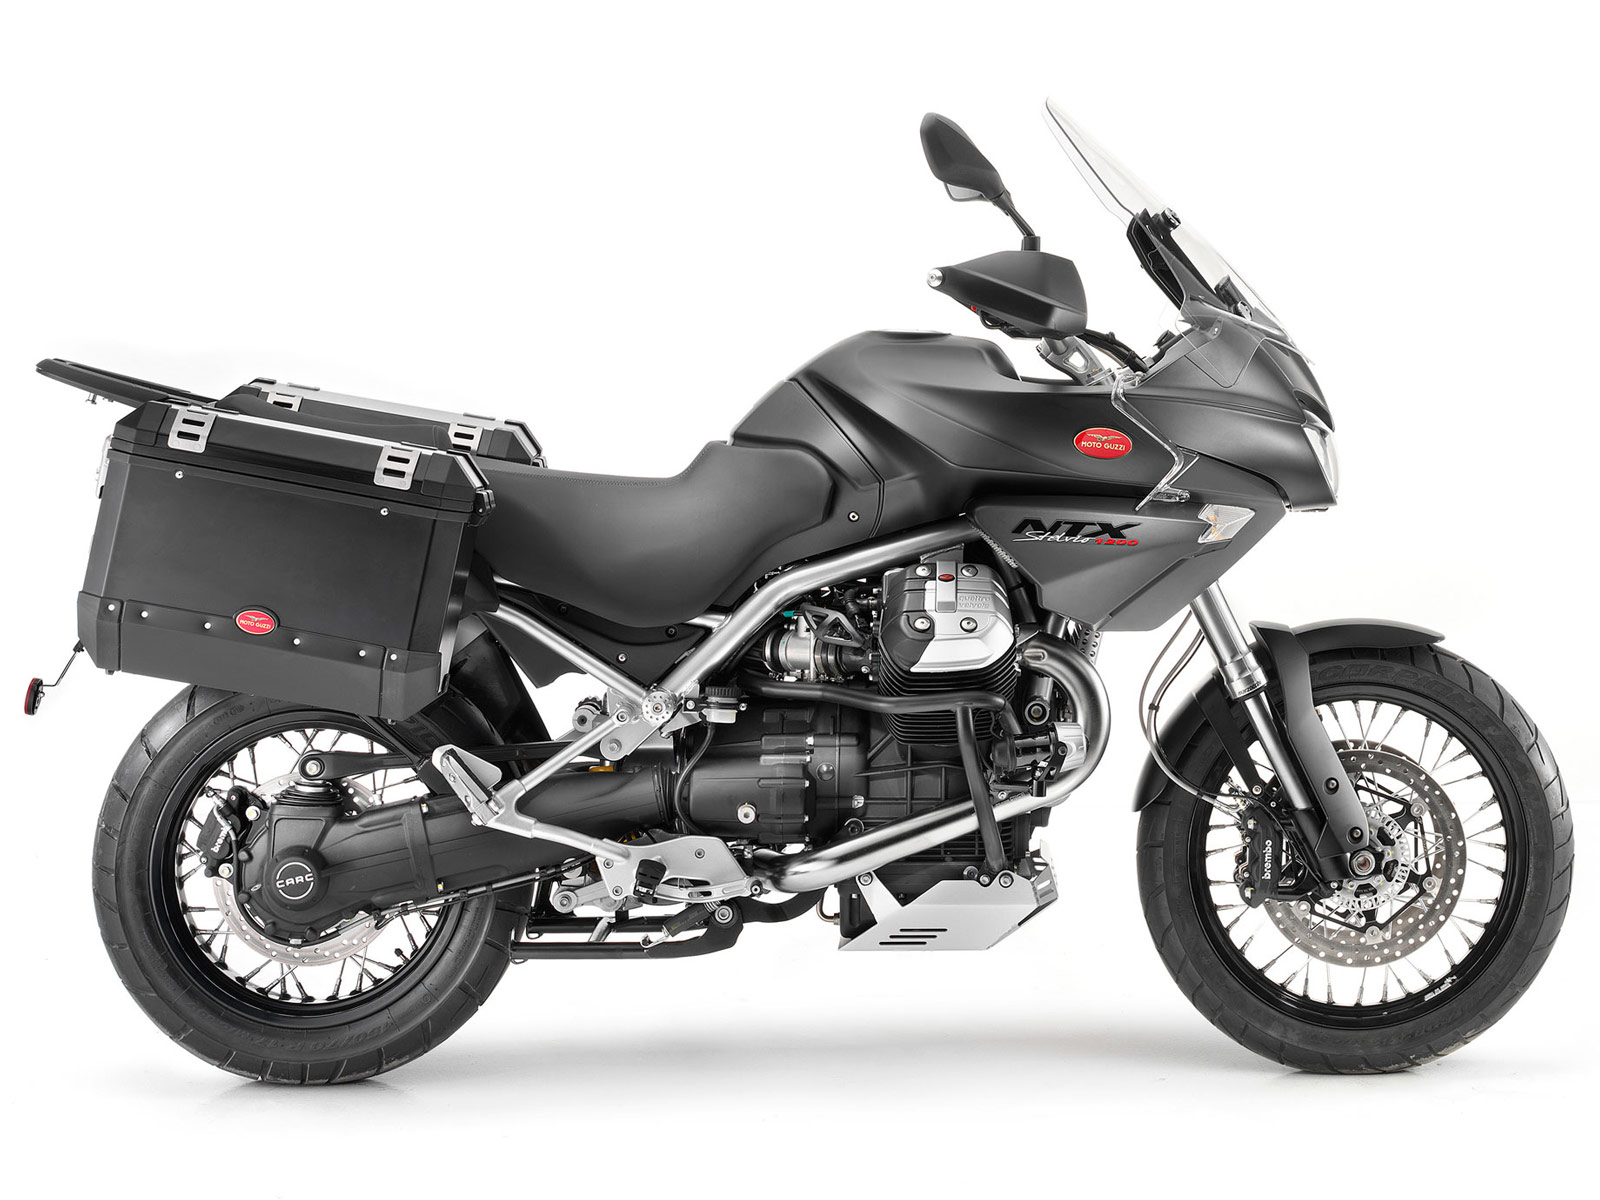 2013 Moto Guzzi Stelvio 1200 NTX motorcycle photos